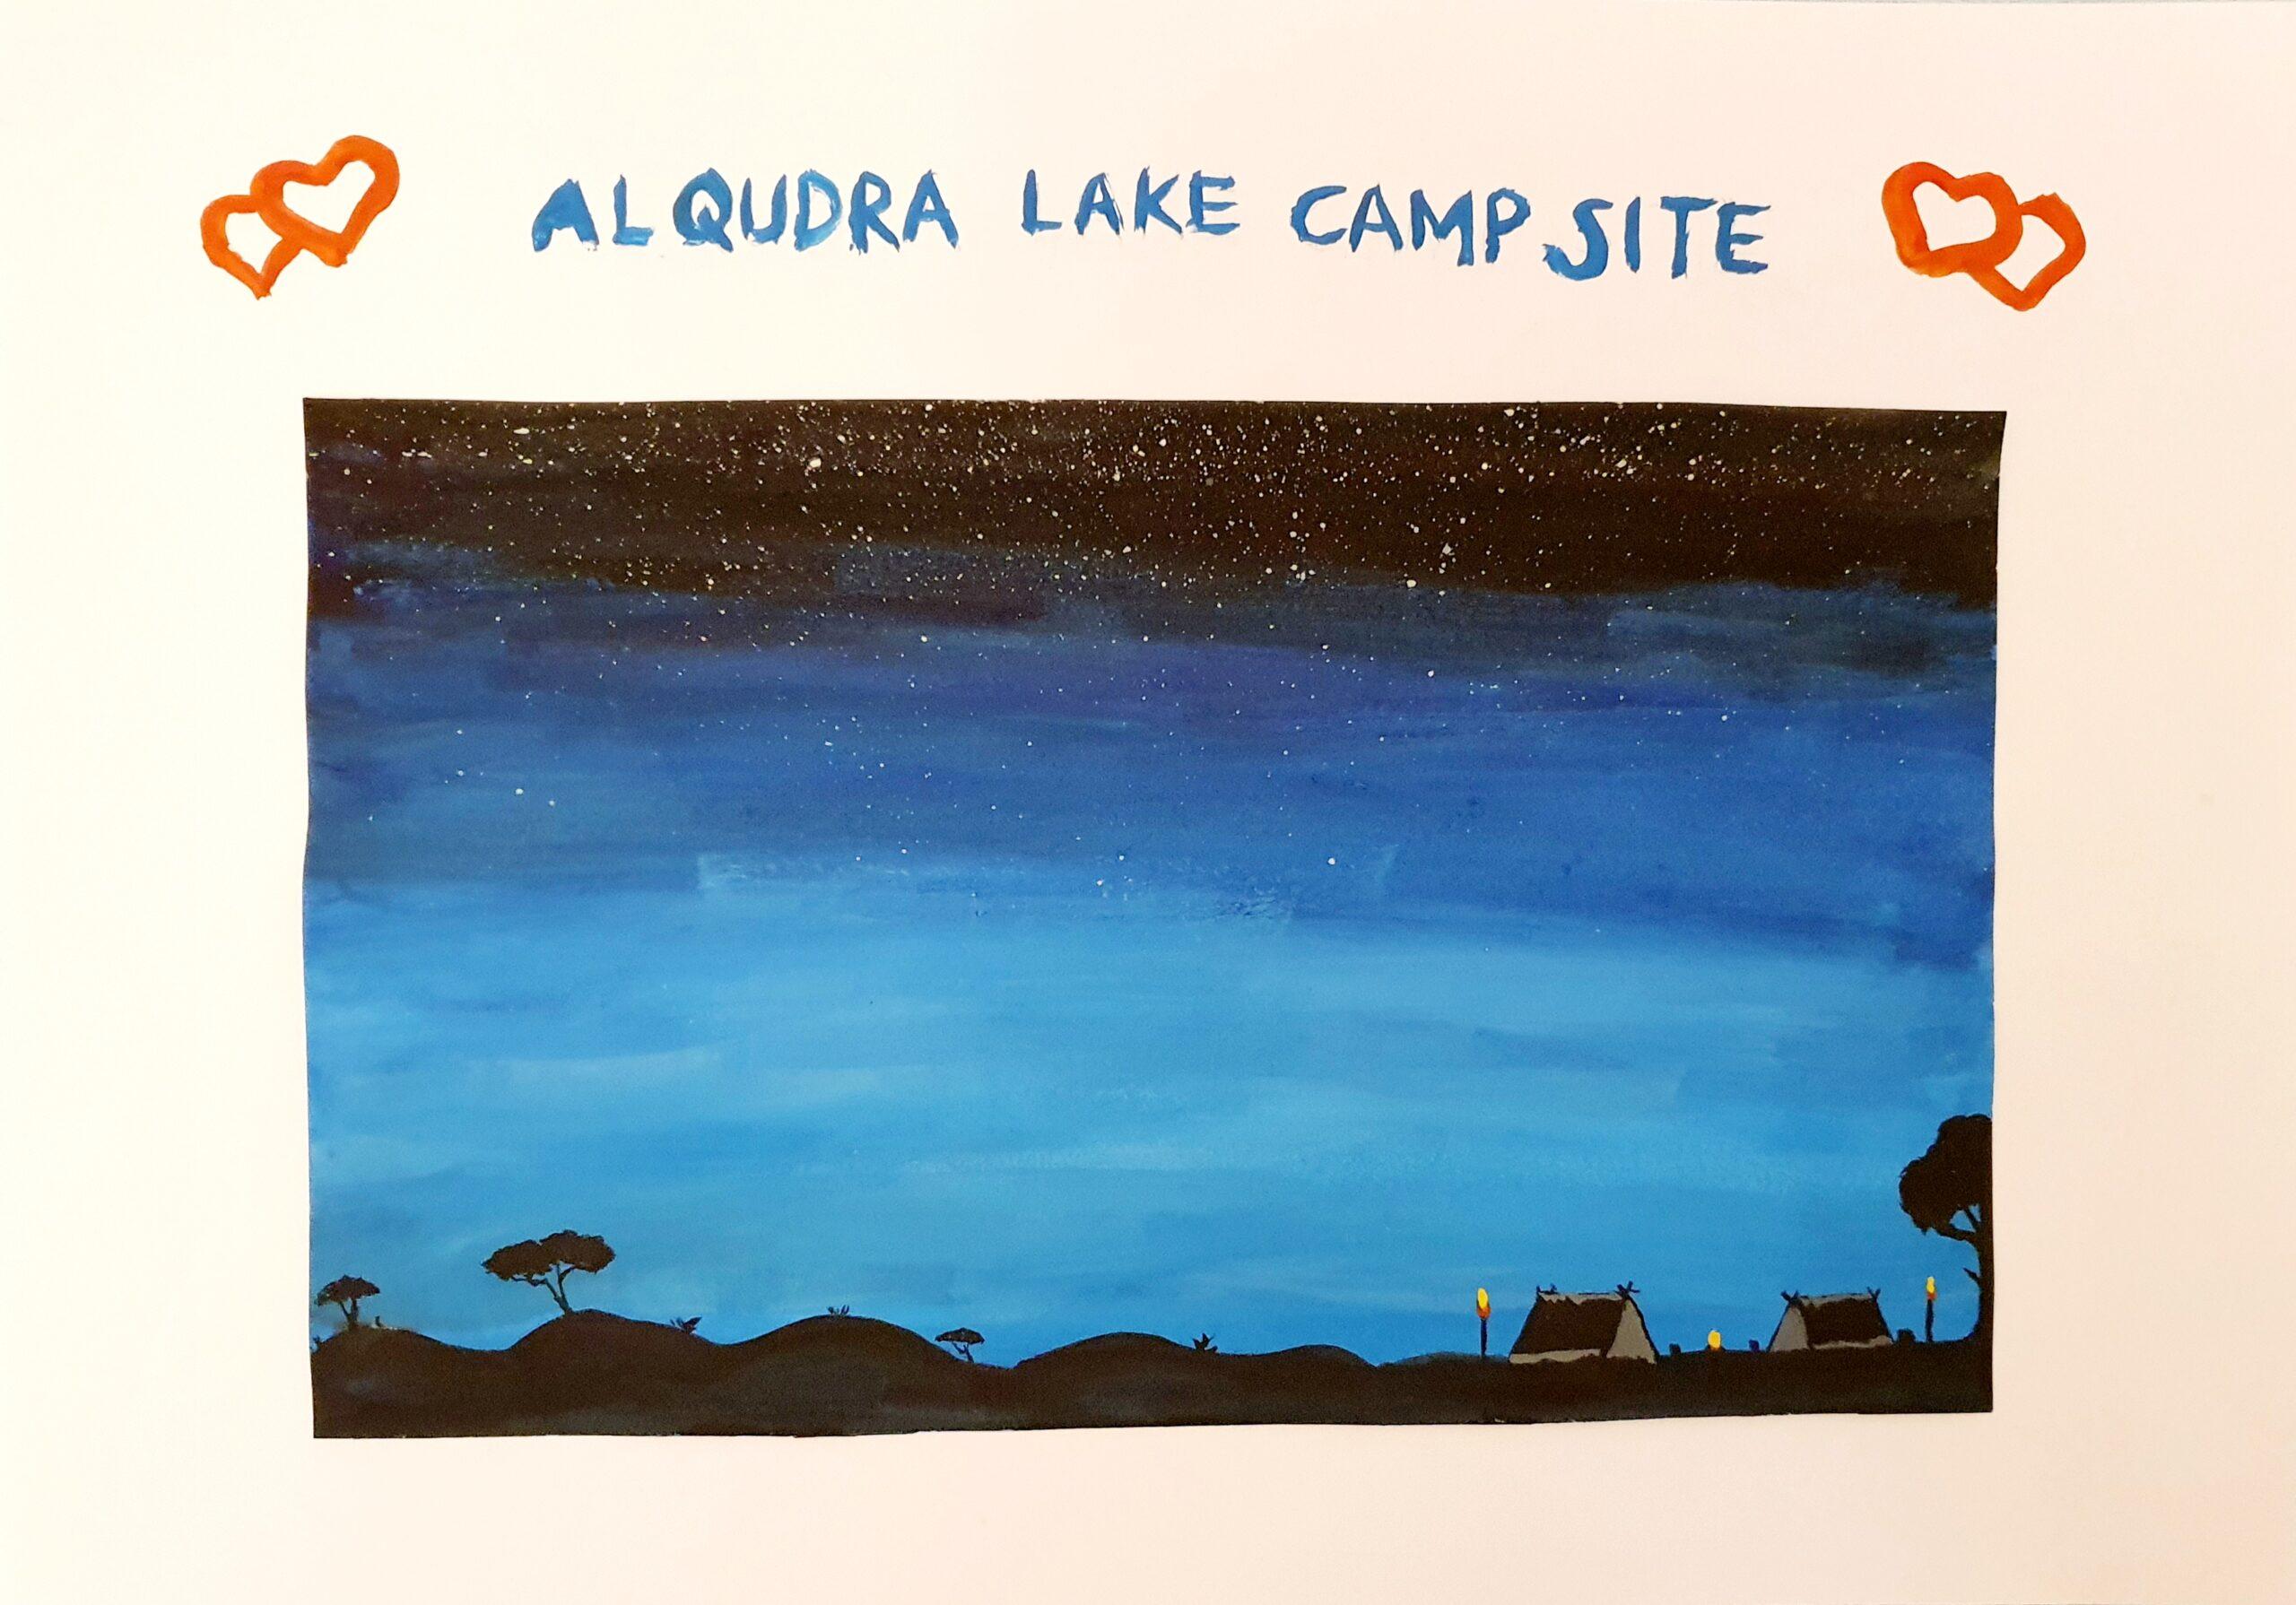 Al Qudra Lake Campsite by Myel Nicholas Heinrich M. Tolentino